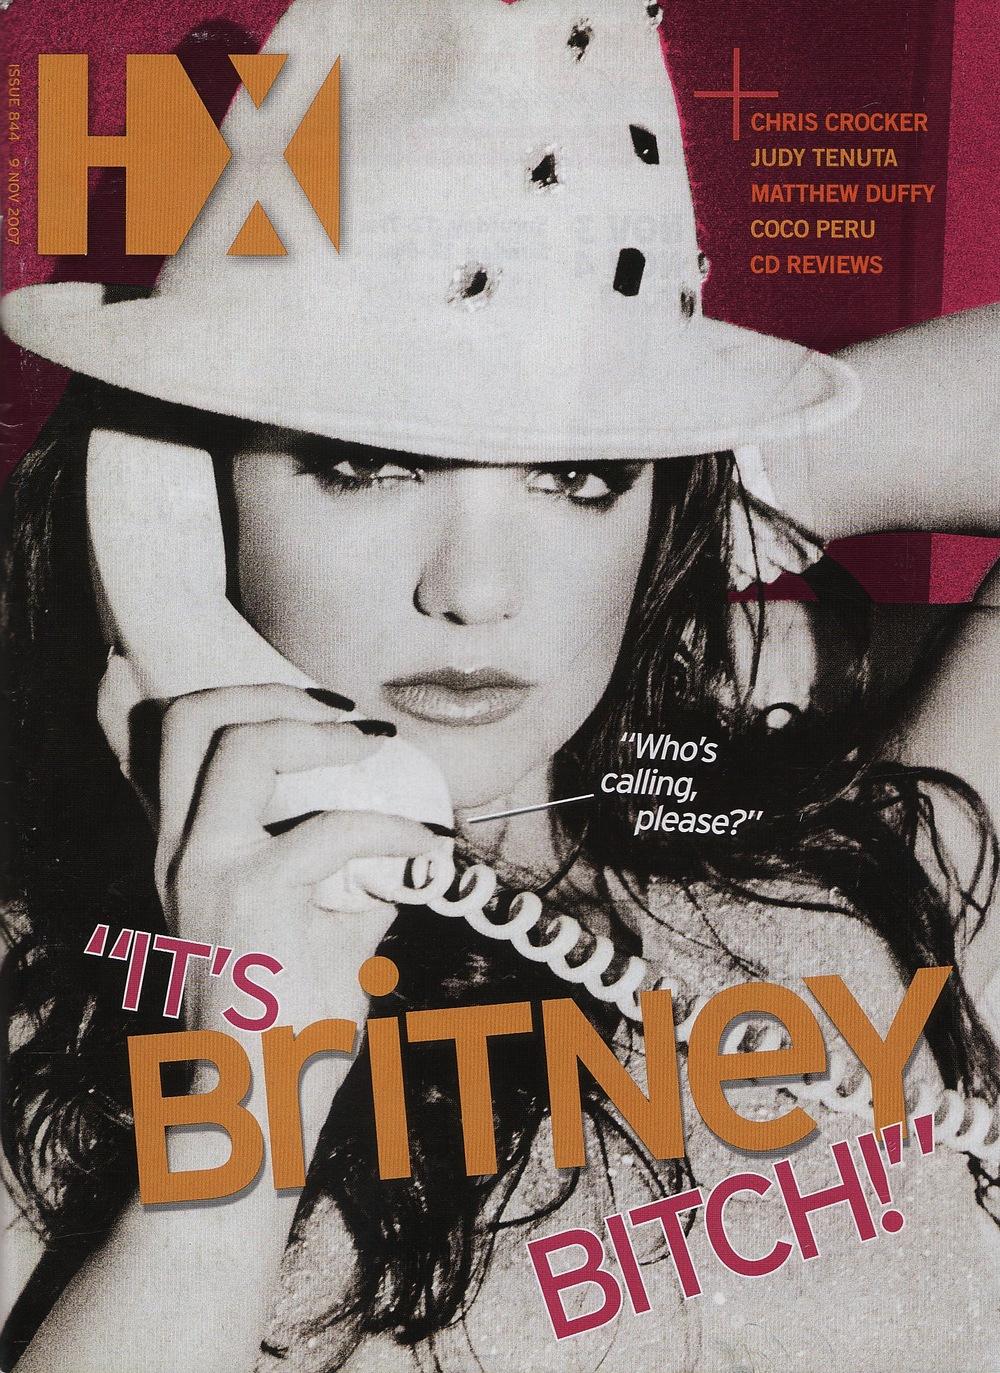 Britneycover.JPG